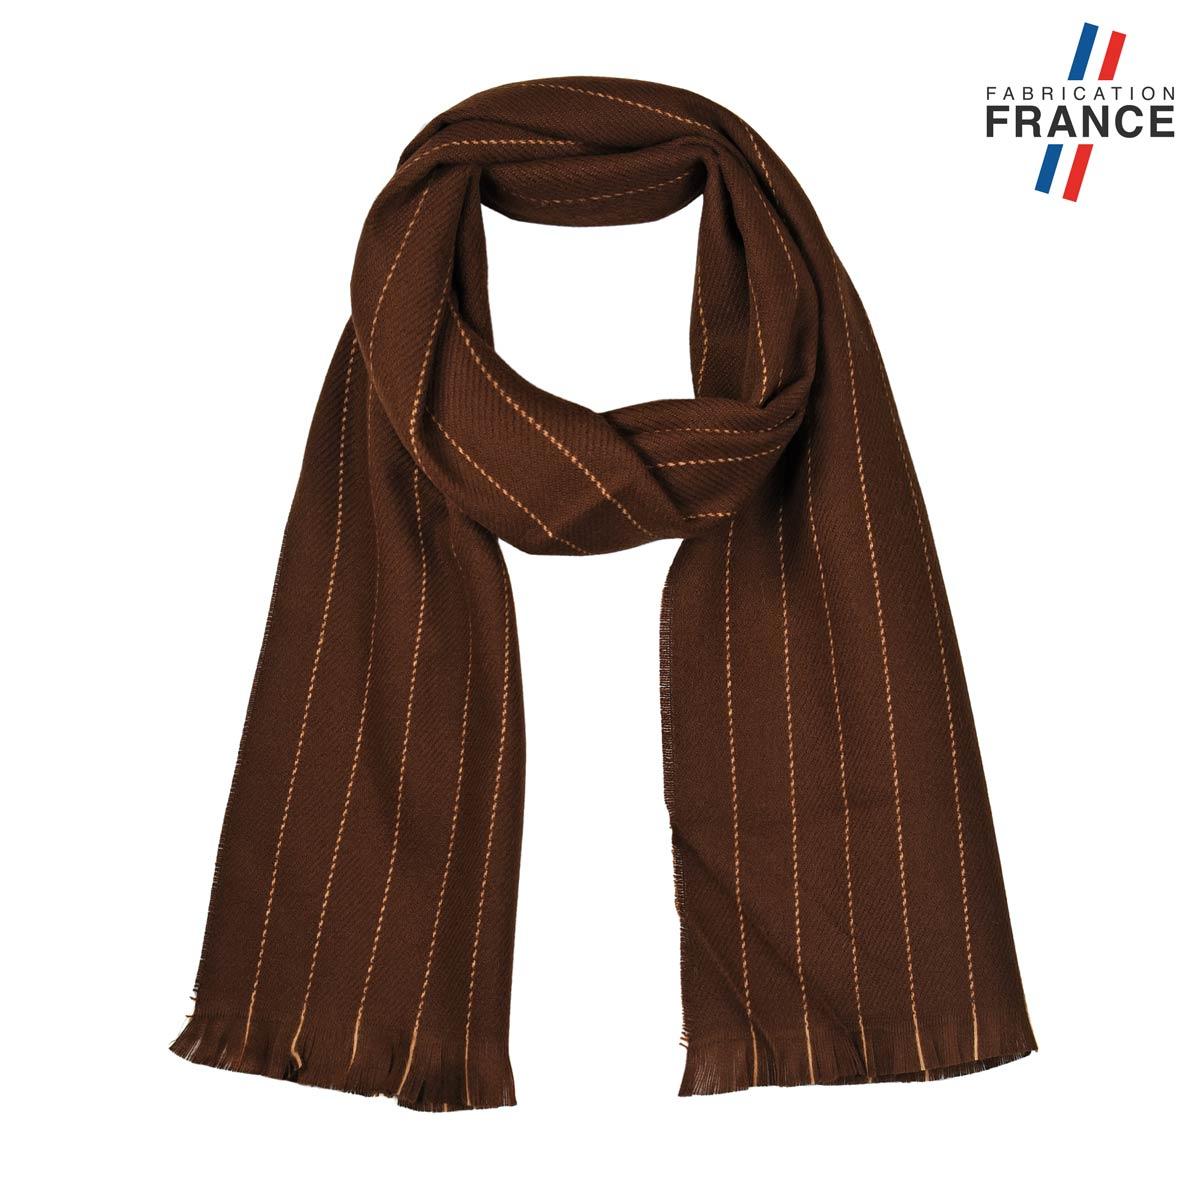 AT-05611_F12-1FR_Echarpe-mixte-marron-fabriquee-en-france